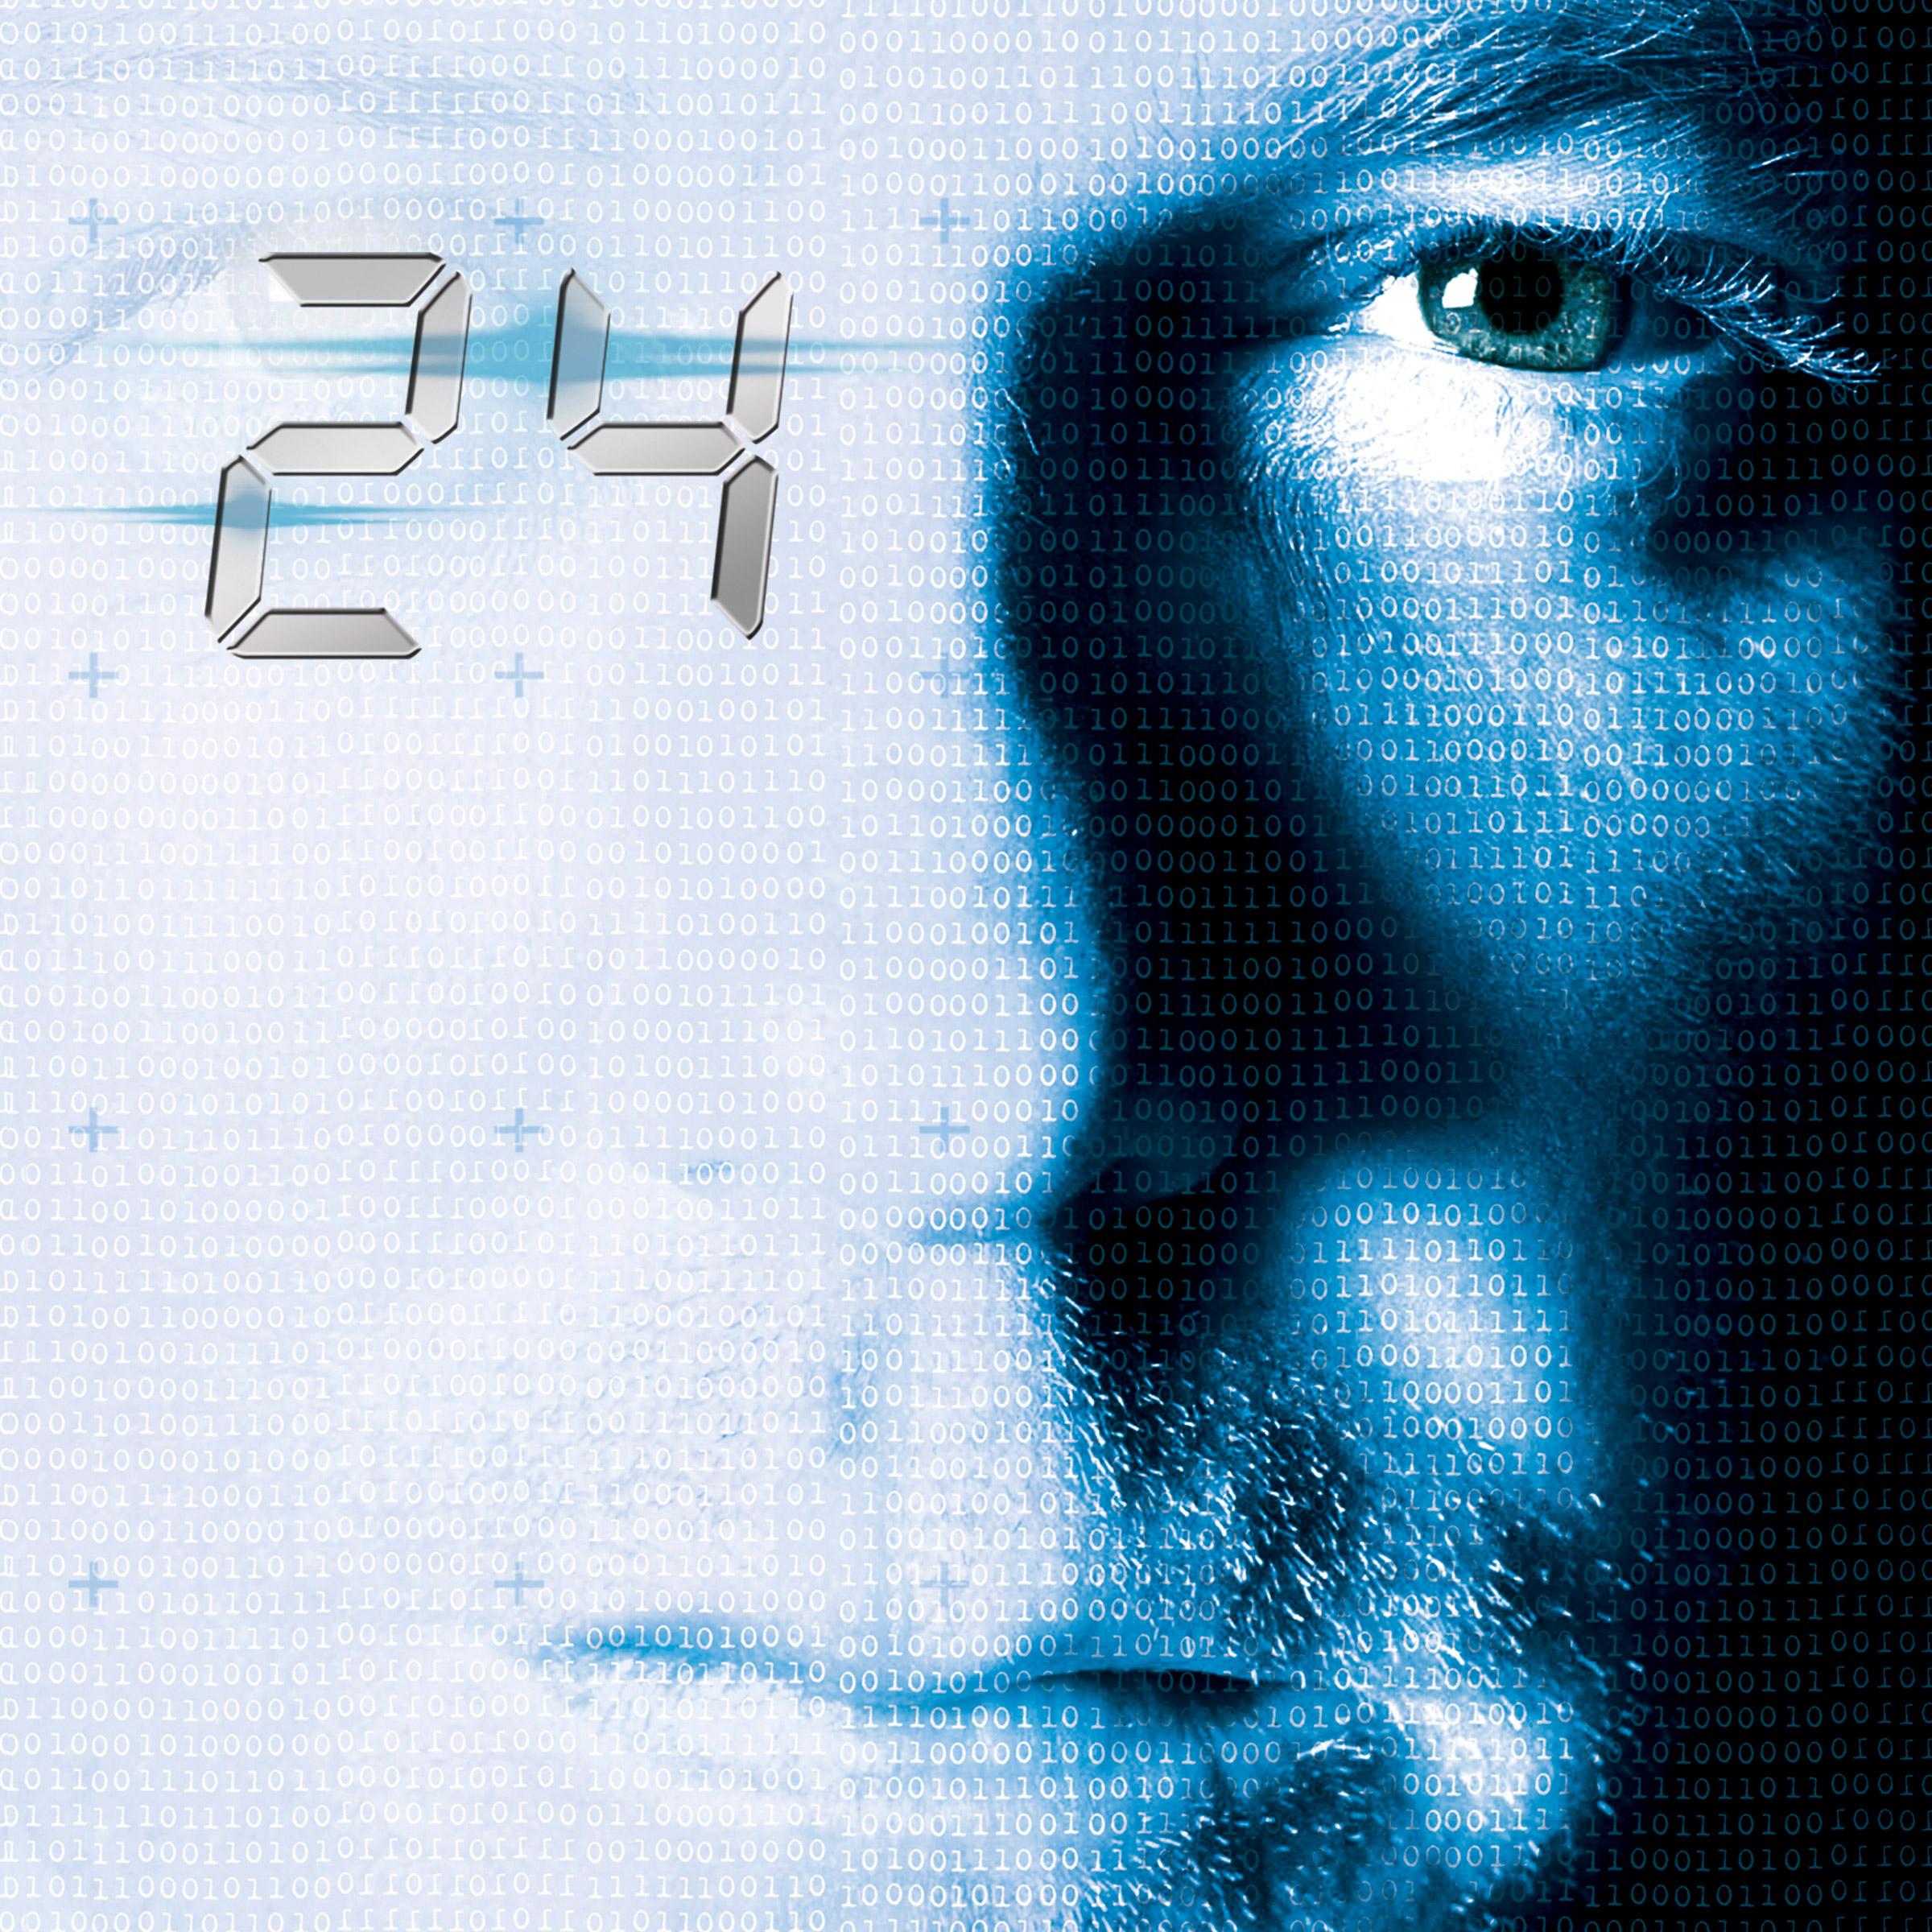 24 season: